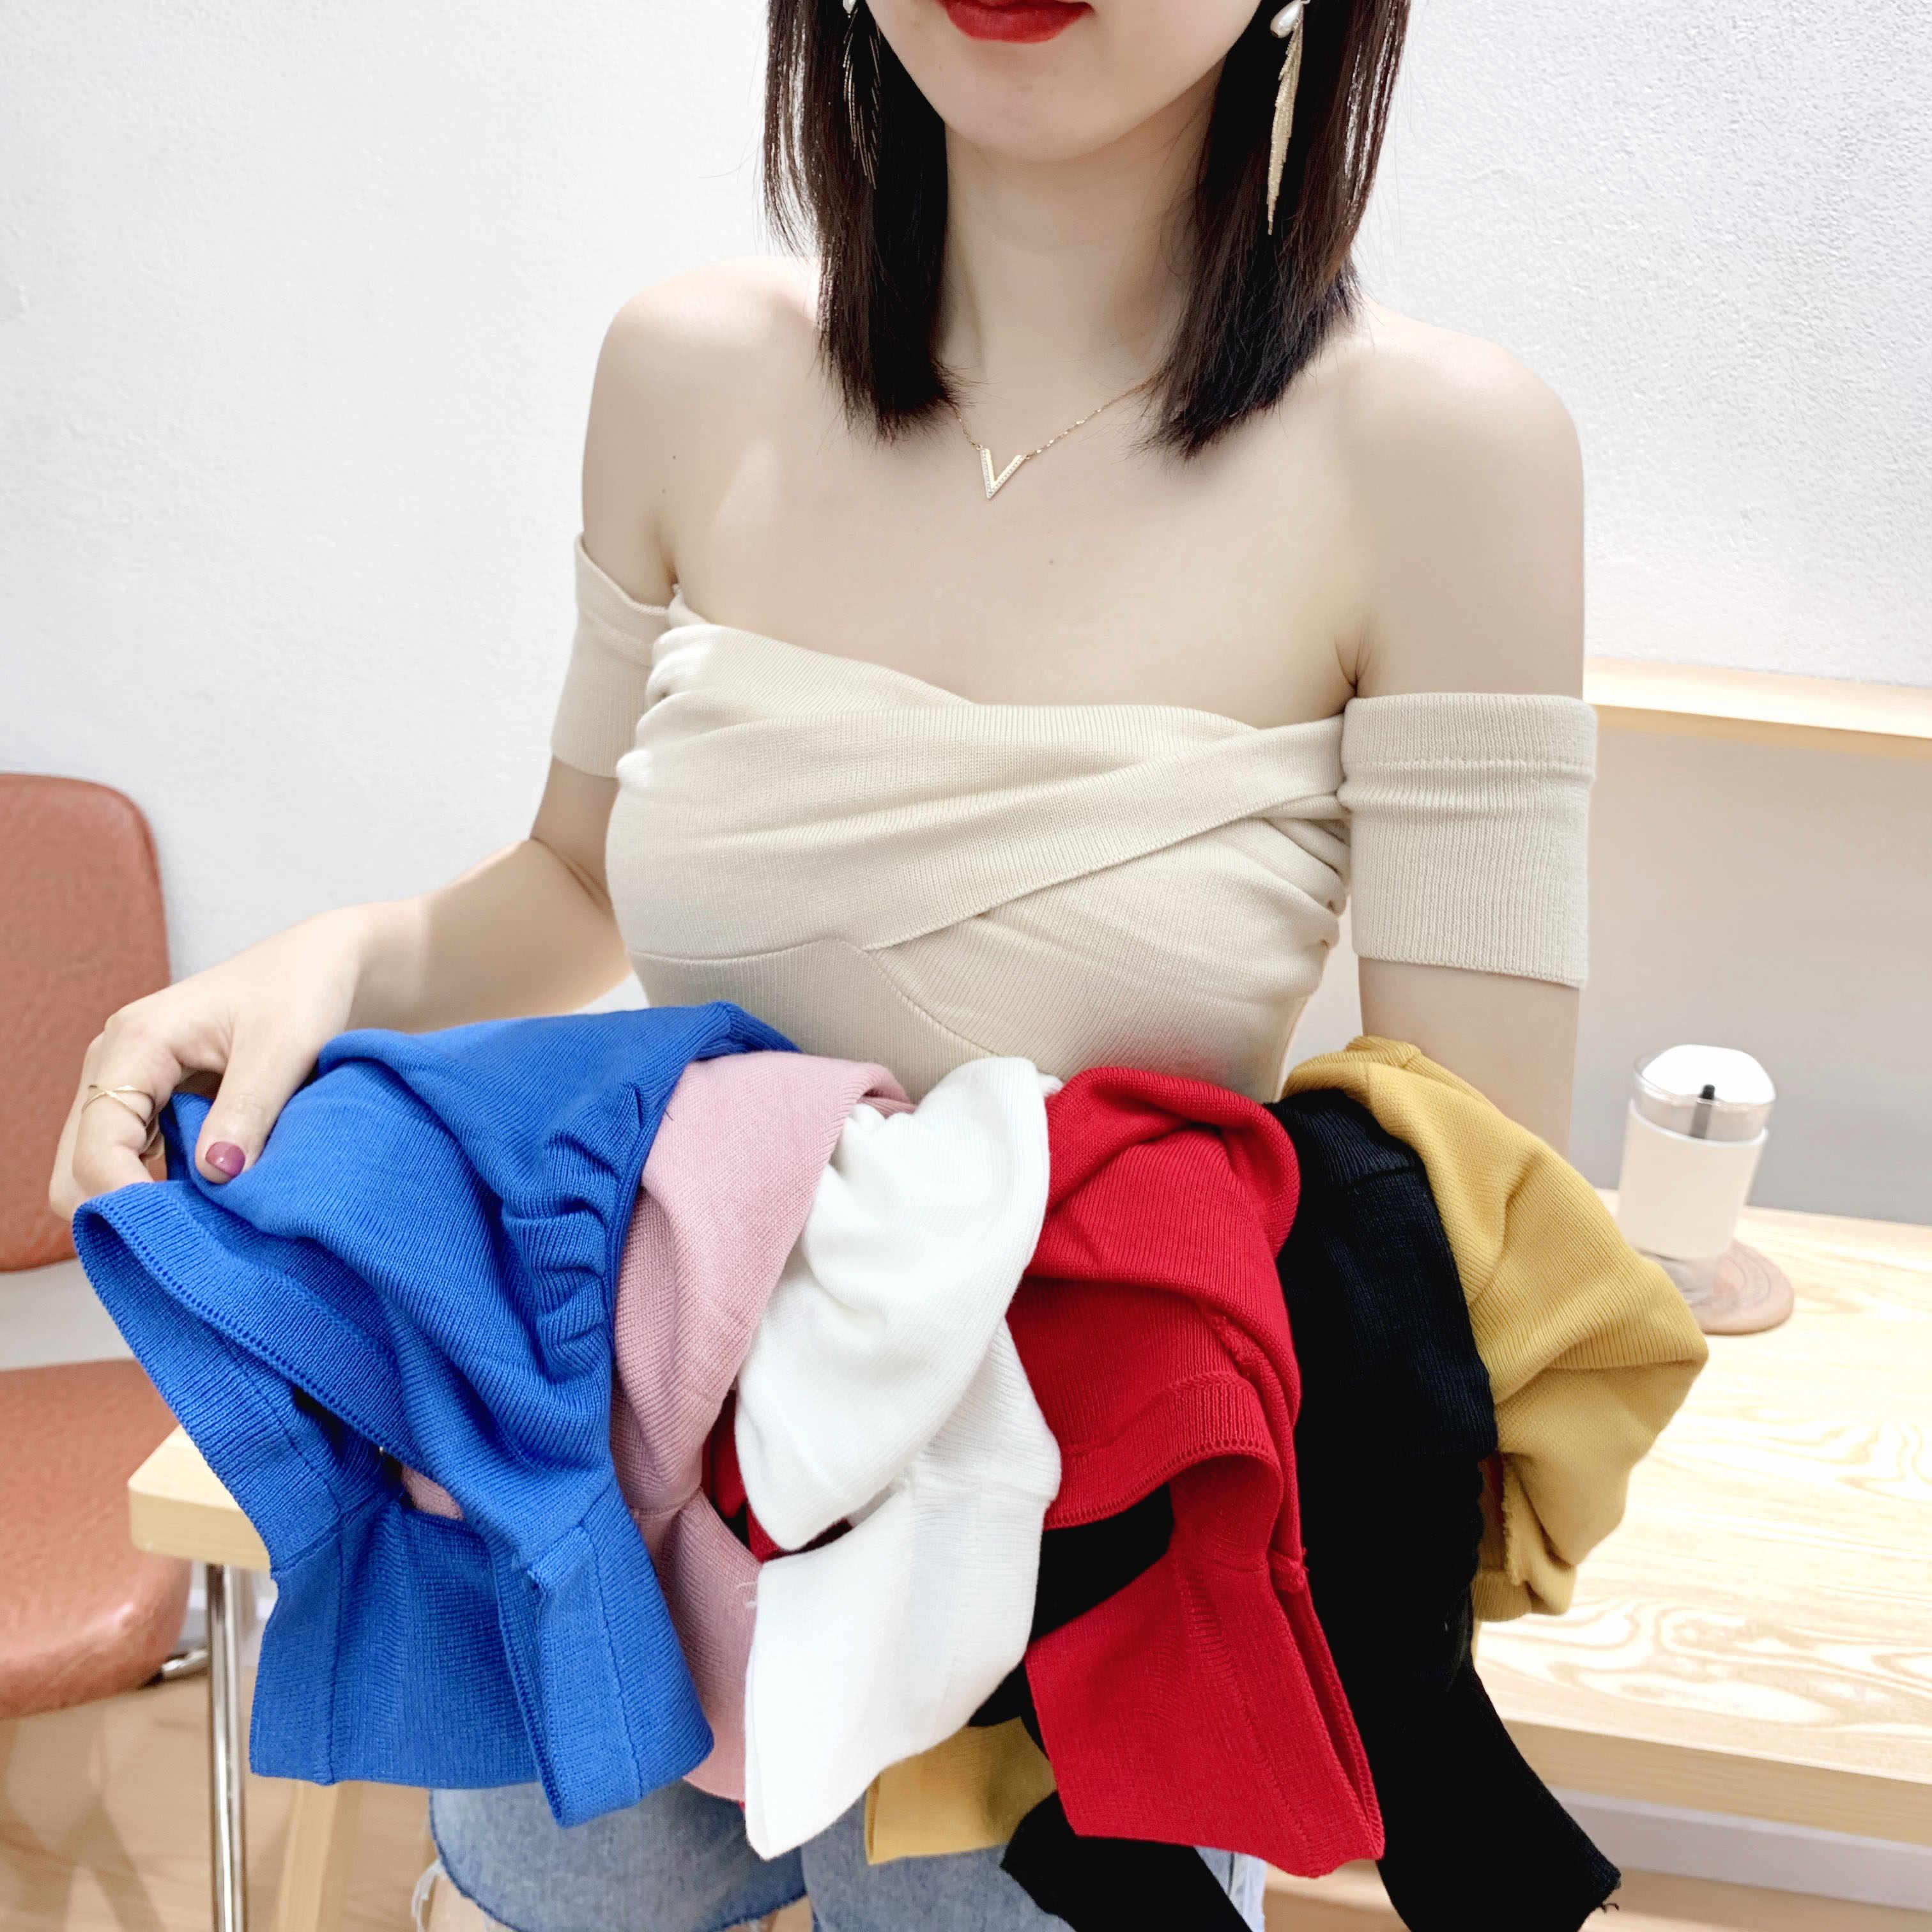 Heliar 오프 숄더 스웨터 여성 섹시 솔리드 Pleated 자르기 탑스 여성을위한 작은 Highstreet 2020 여름 탑스 스웨터